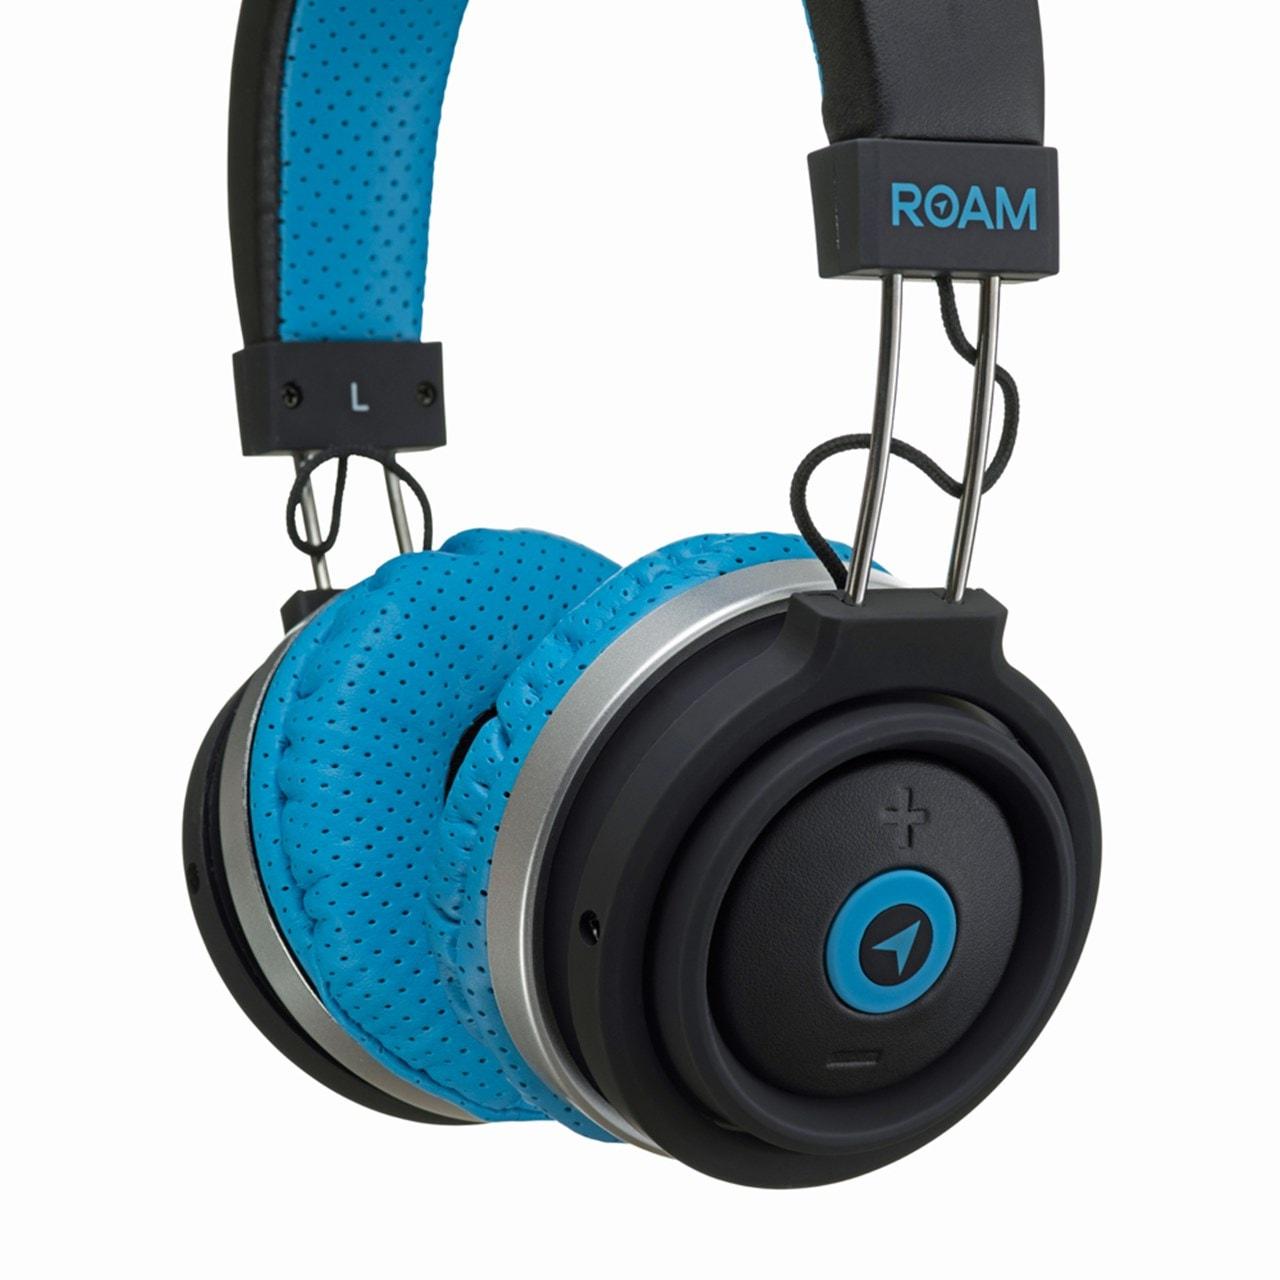 Roam Sport Blue Bluetooth Headphones (hmv Exclusive) - 2